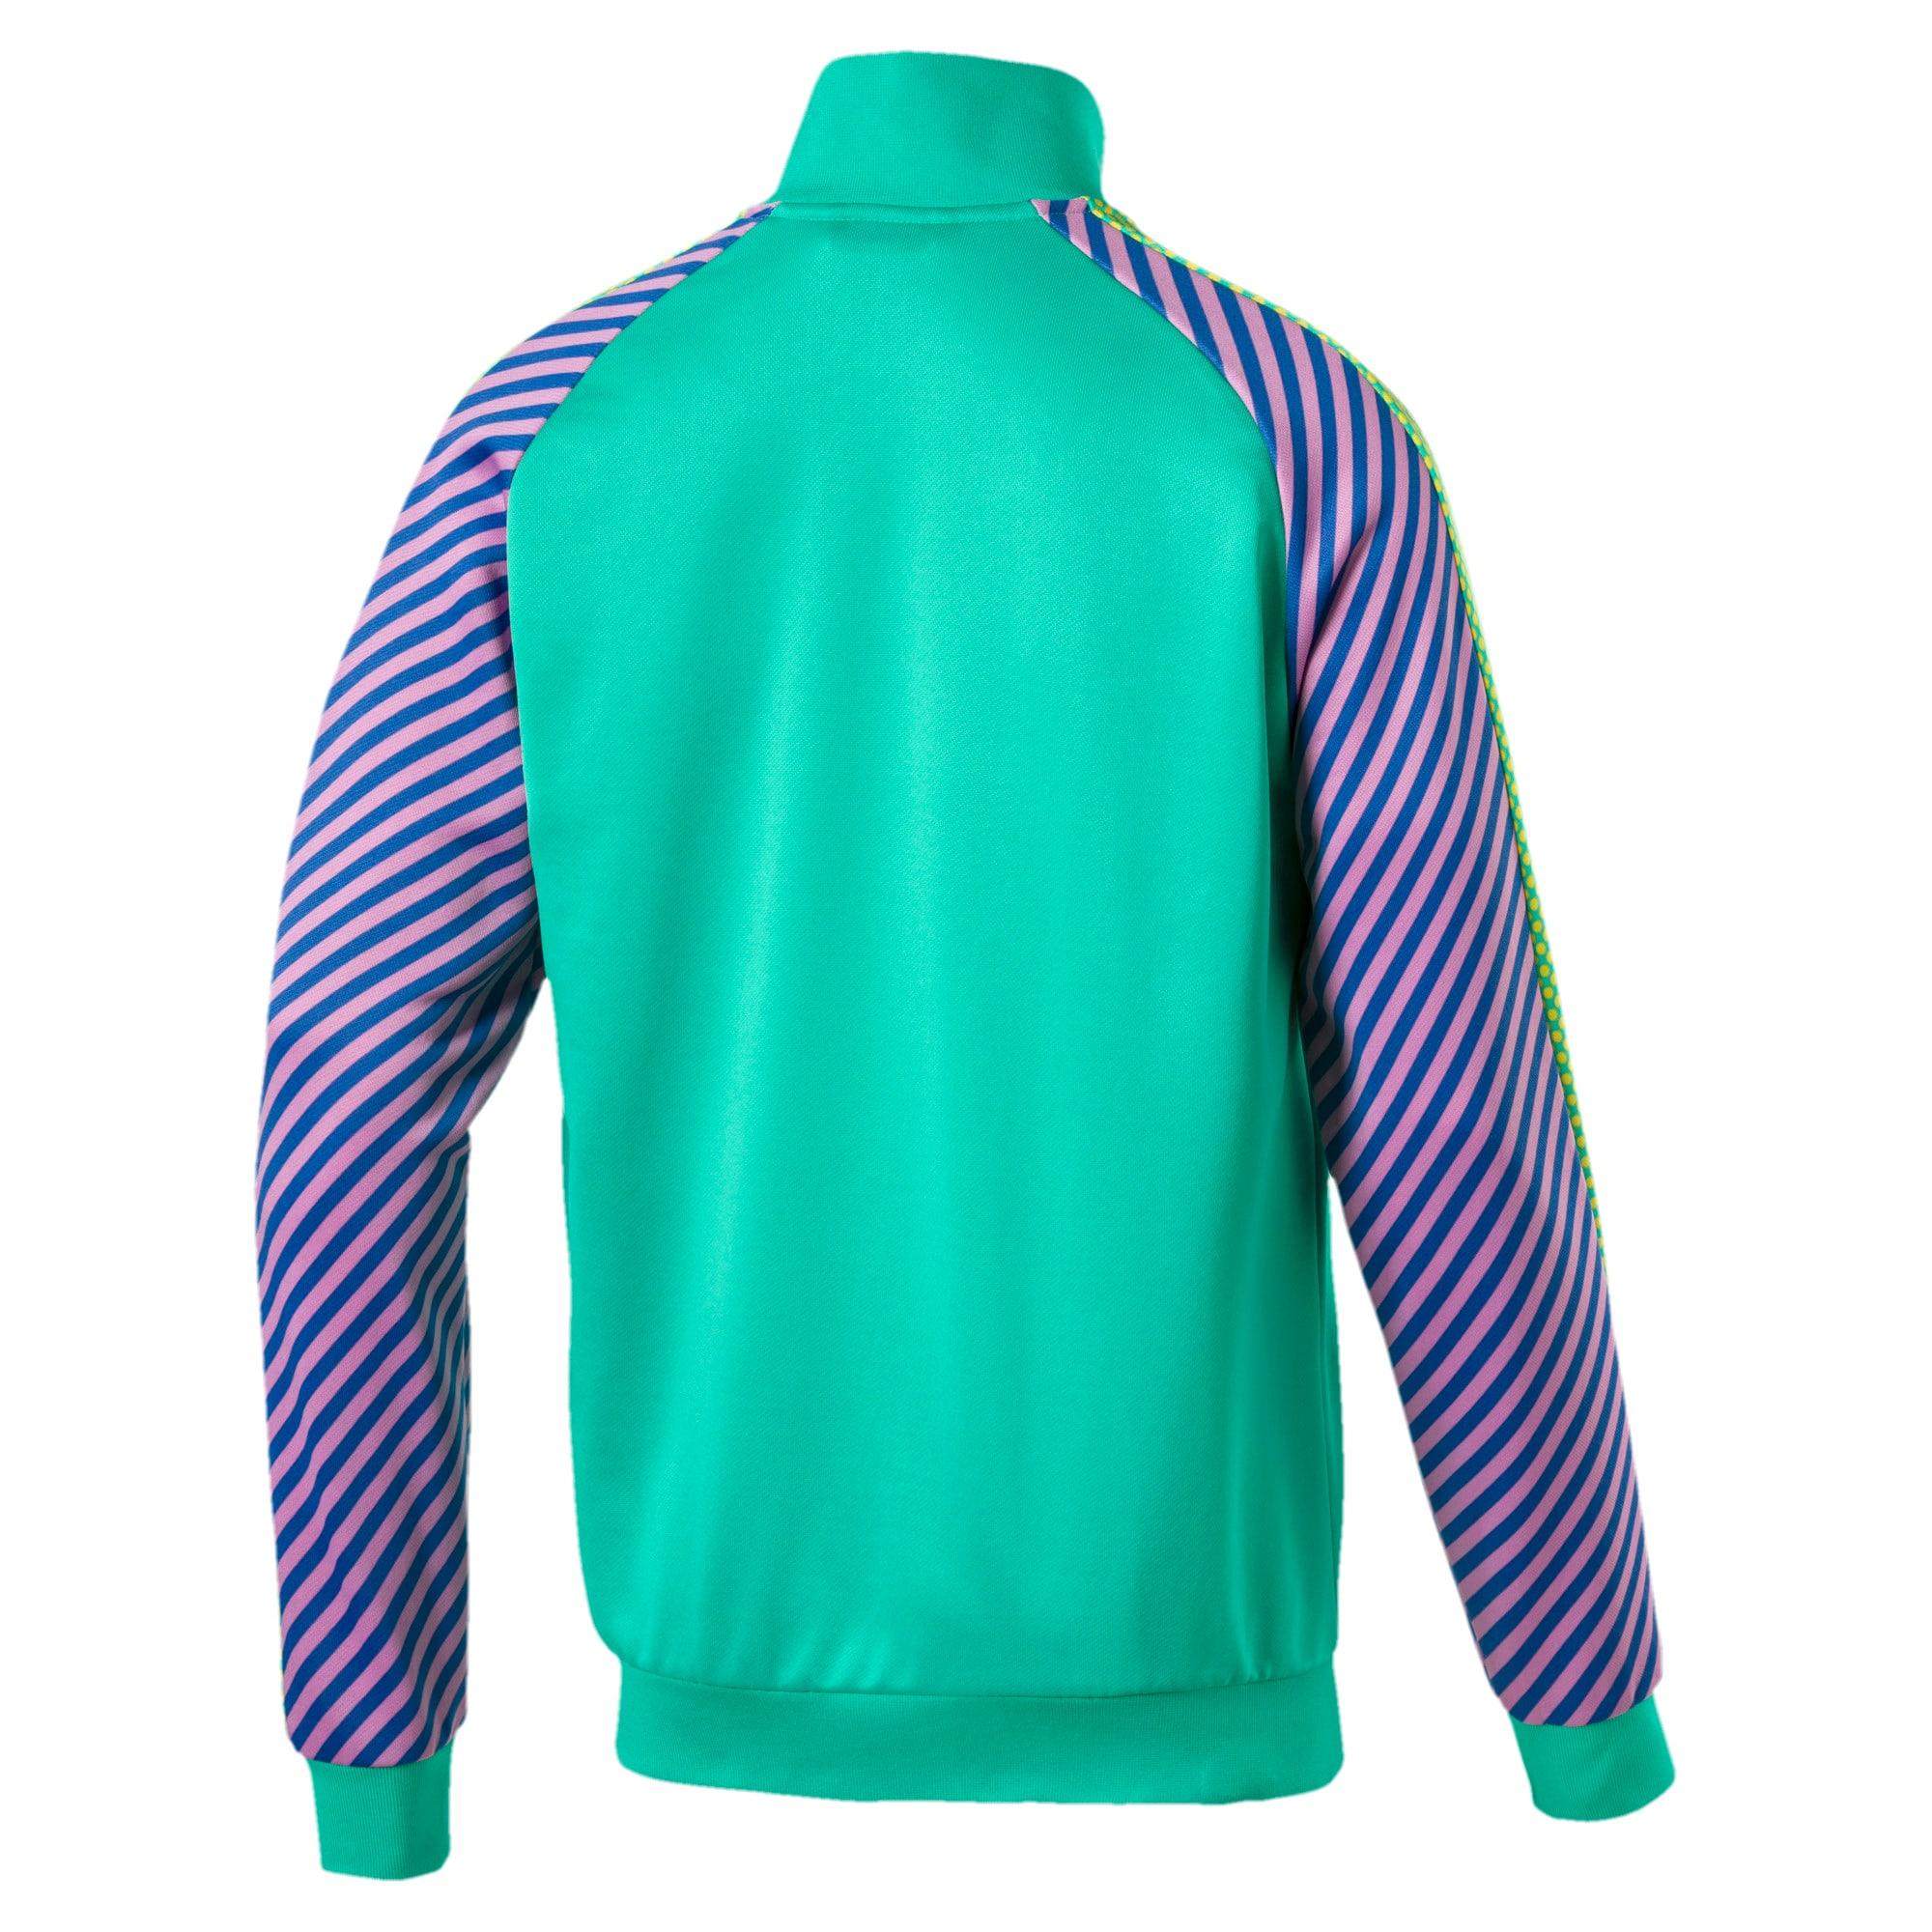 Thumbnail 3 of T7 Pop Zip-Up Men's Track Jacket, Biscay Green, medium